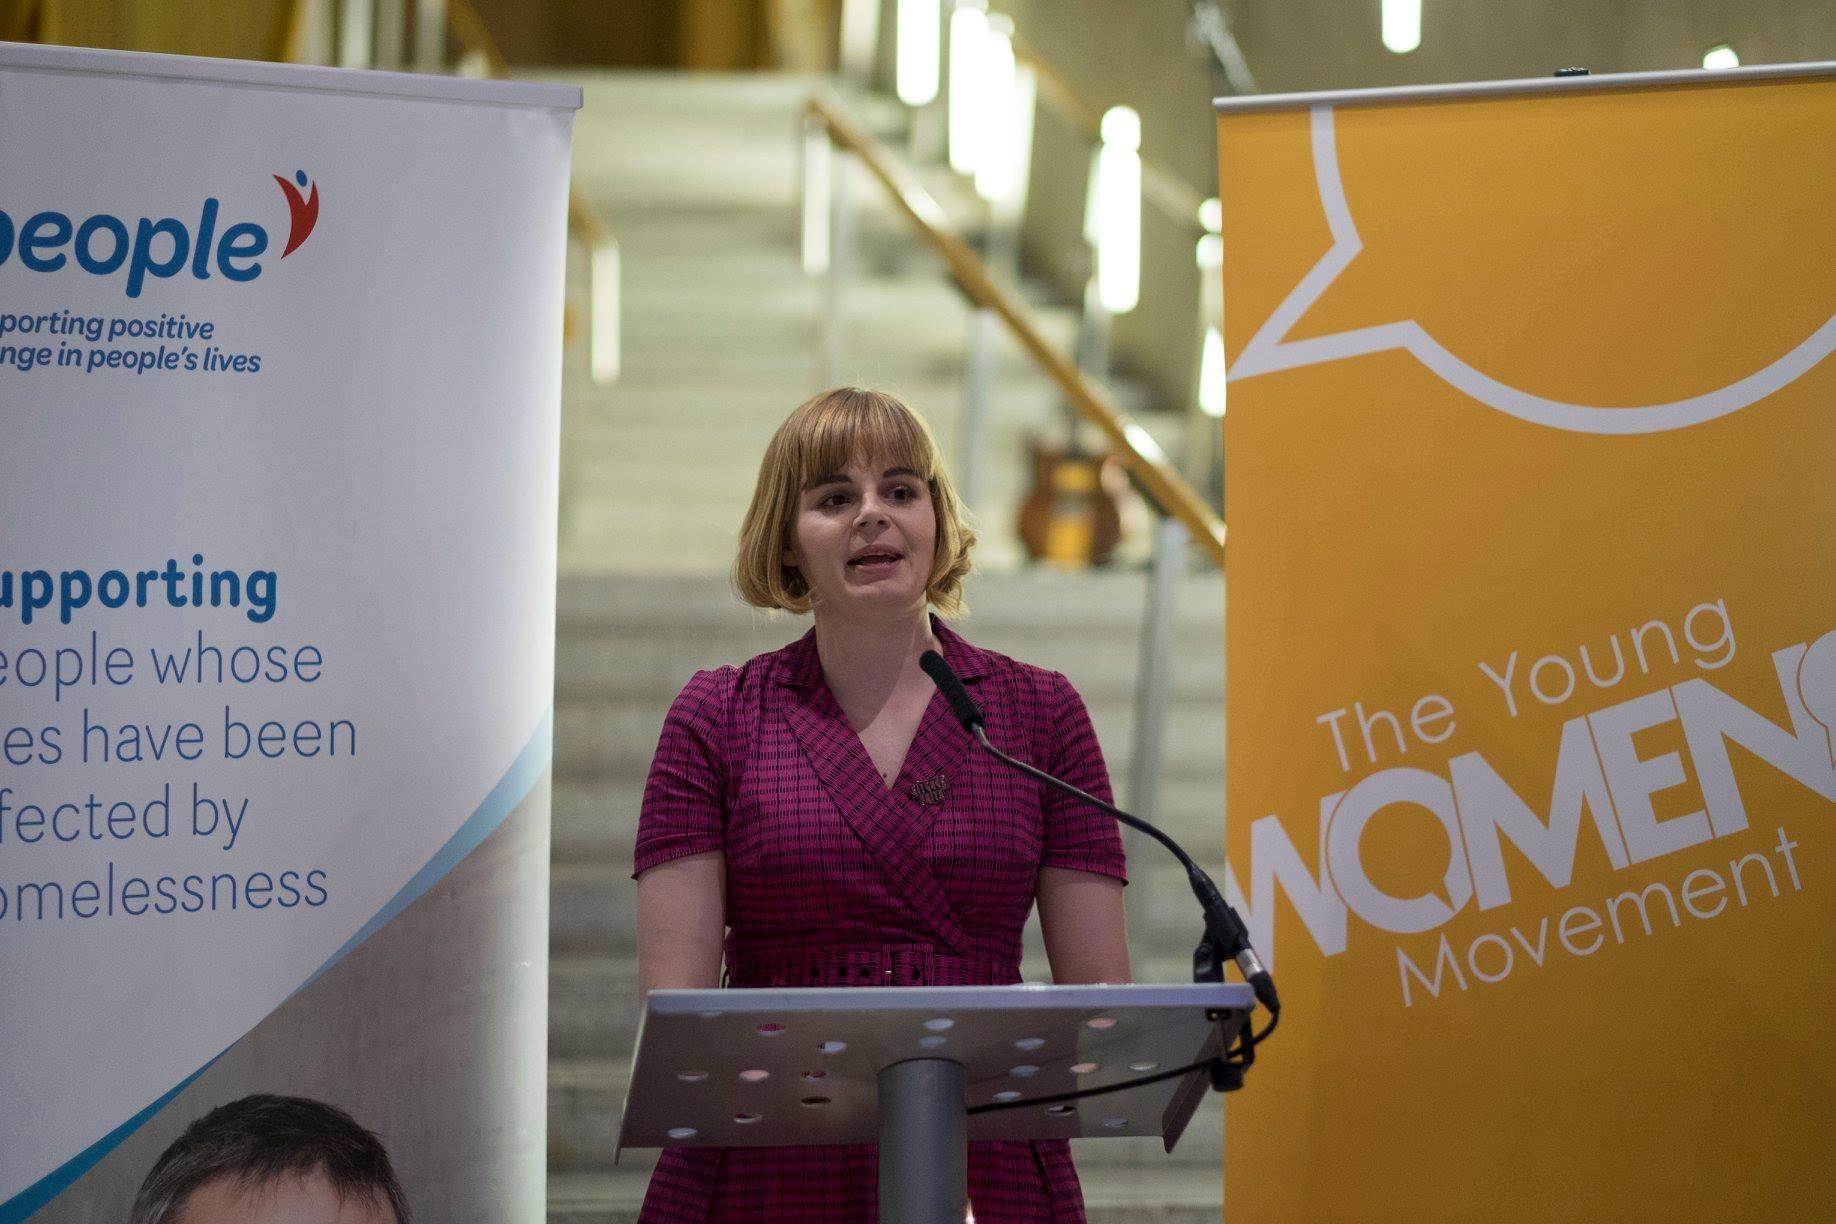 Patrycja Kupiec - Director, YWCA Scotland - The Young Women's Movement